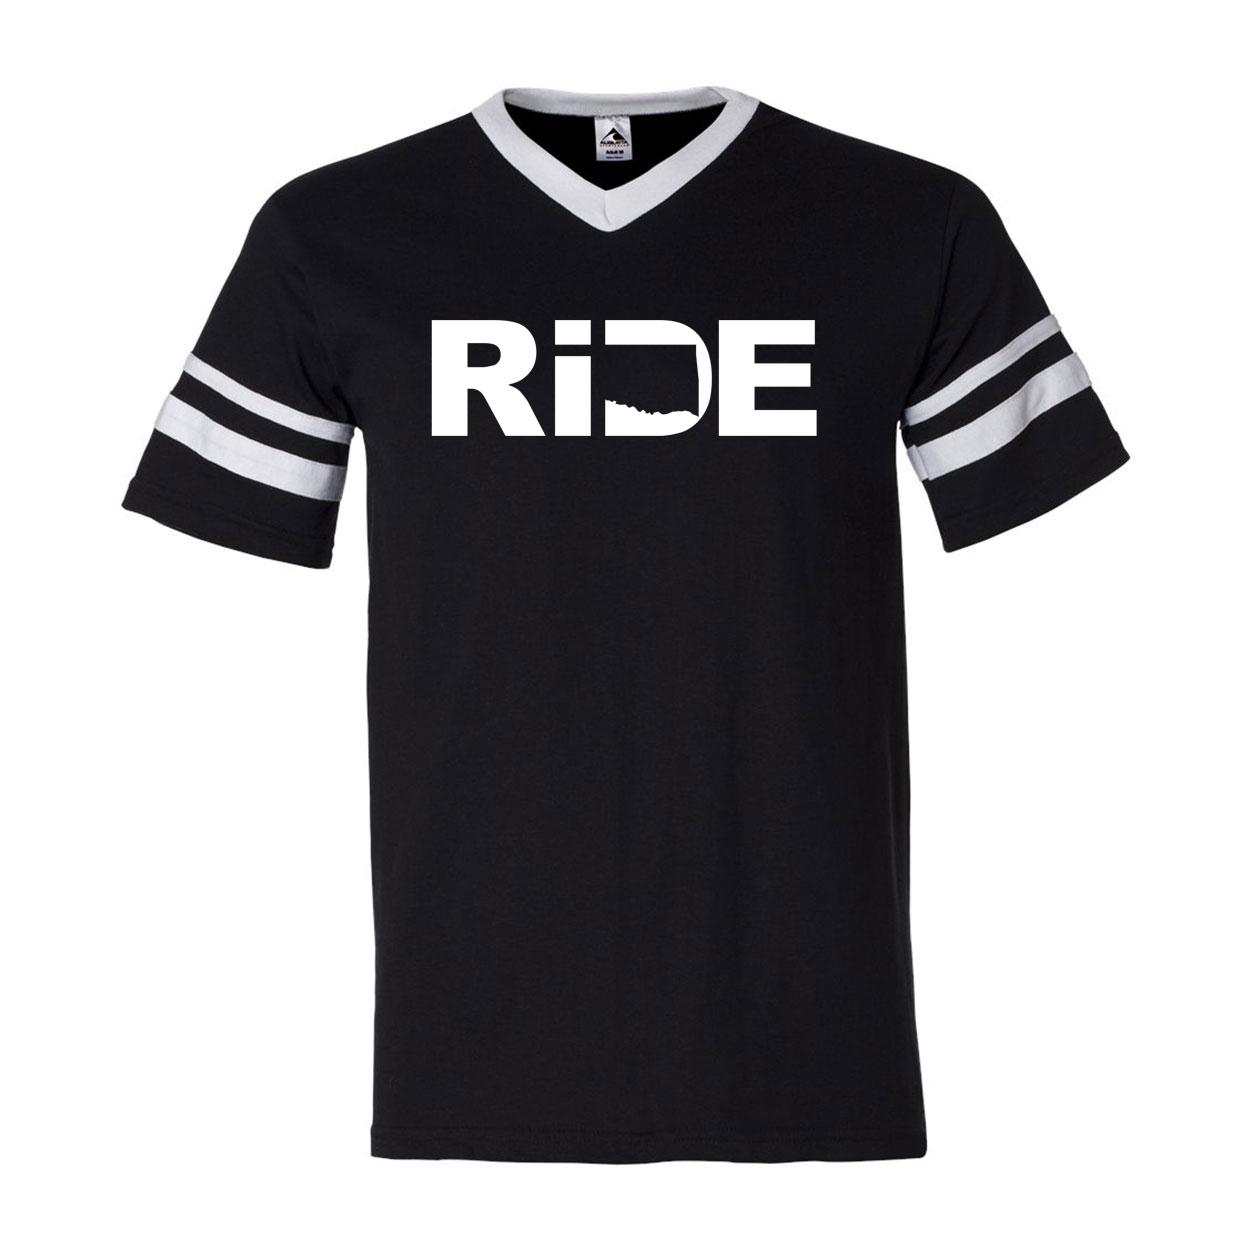 Ride Oklahoma Classic Premium Striped Jersey T-Shirt Black/White (White Logo)